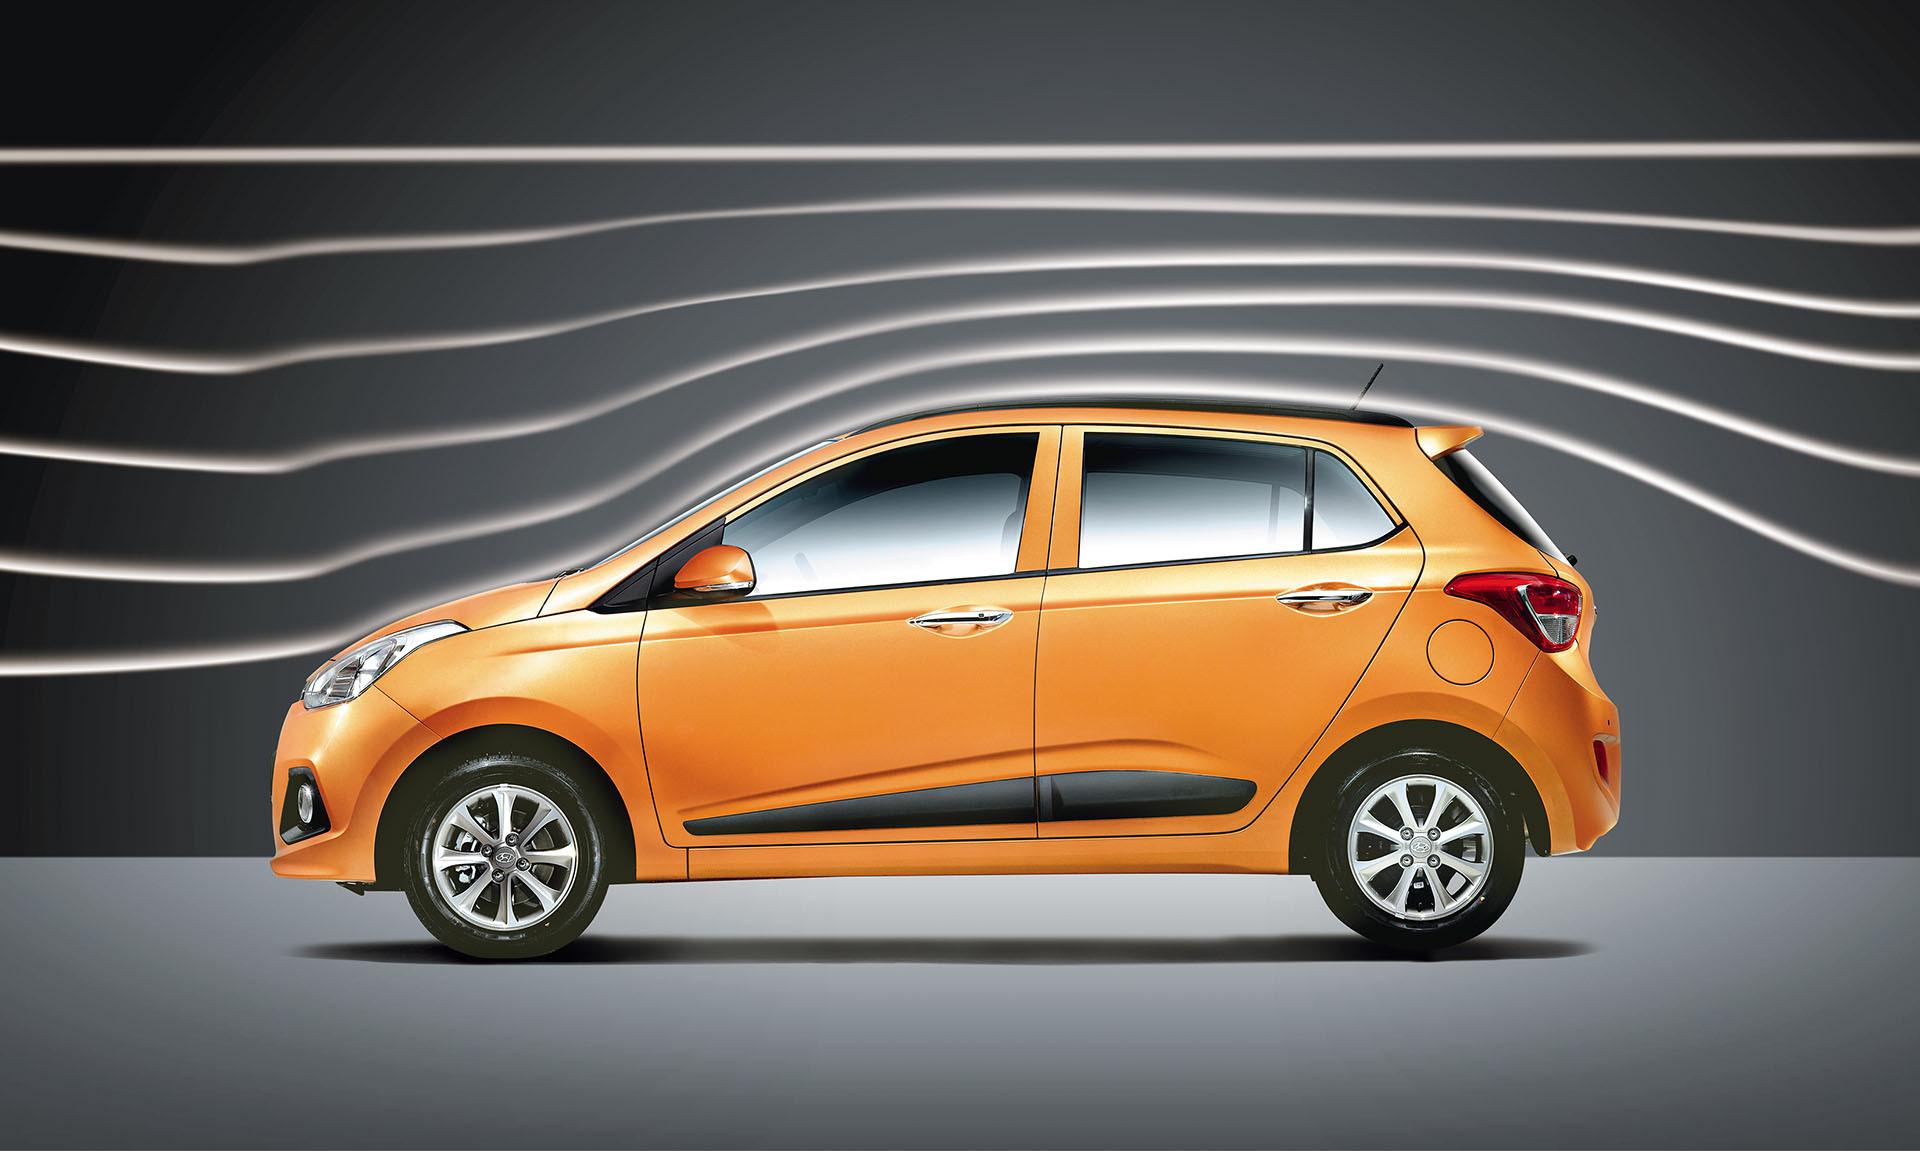 Hyundai Grand i10 fastest to cross the 1 lakh sales mark